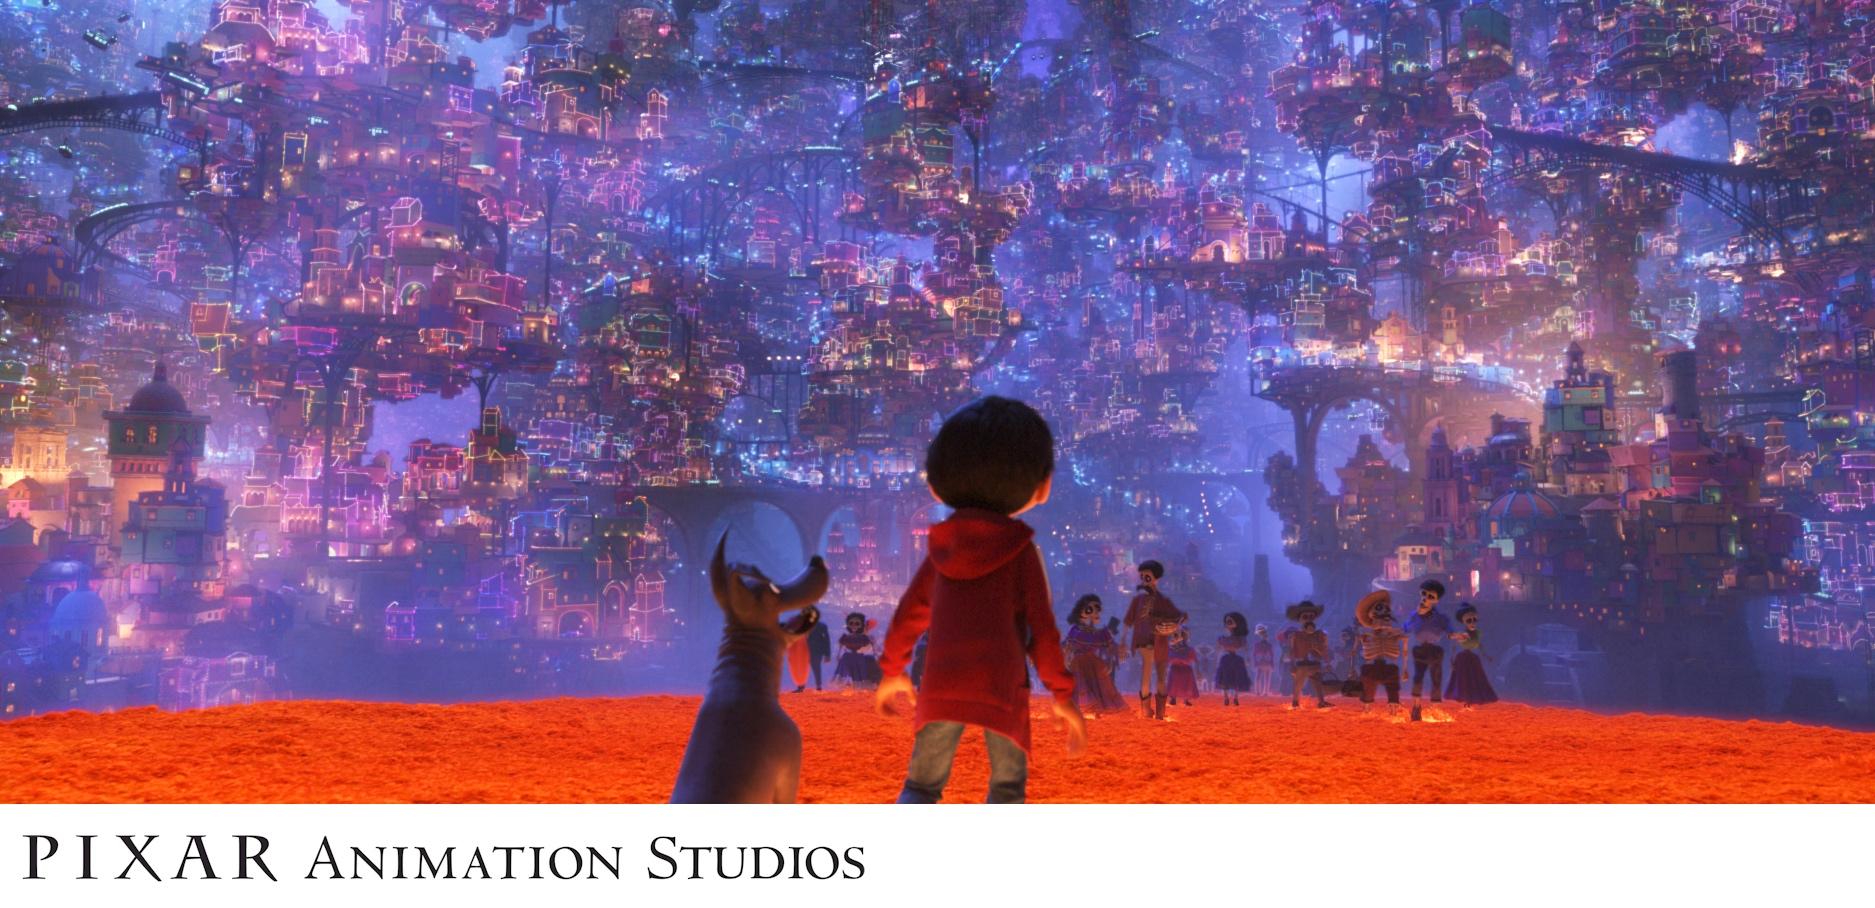 PixarCoco-image-1.jpg